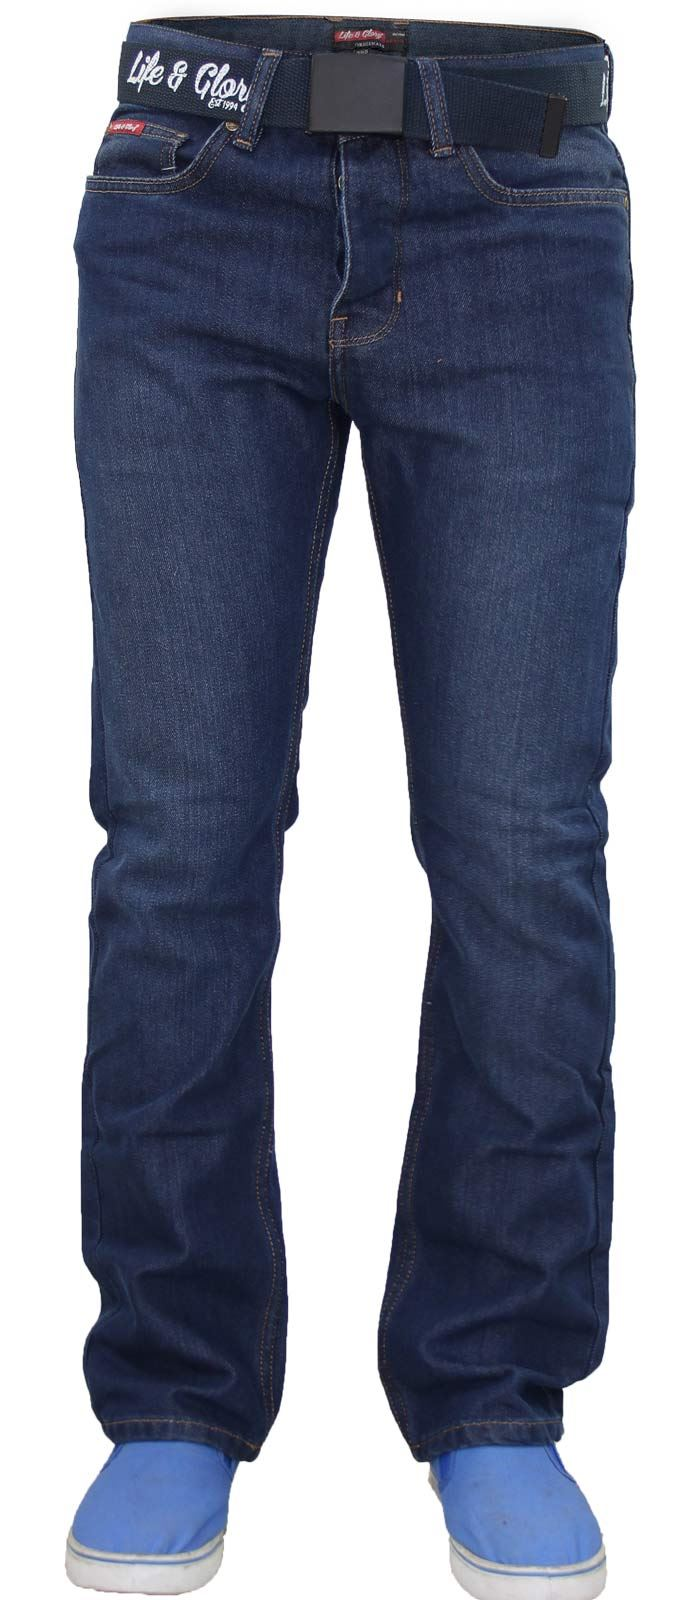 Men-Regular-Fit-Jeans-Denim-Button-Fly-Straight-Leg-Trouser-Pant-With-Free-Belt thumbnail 11